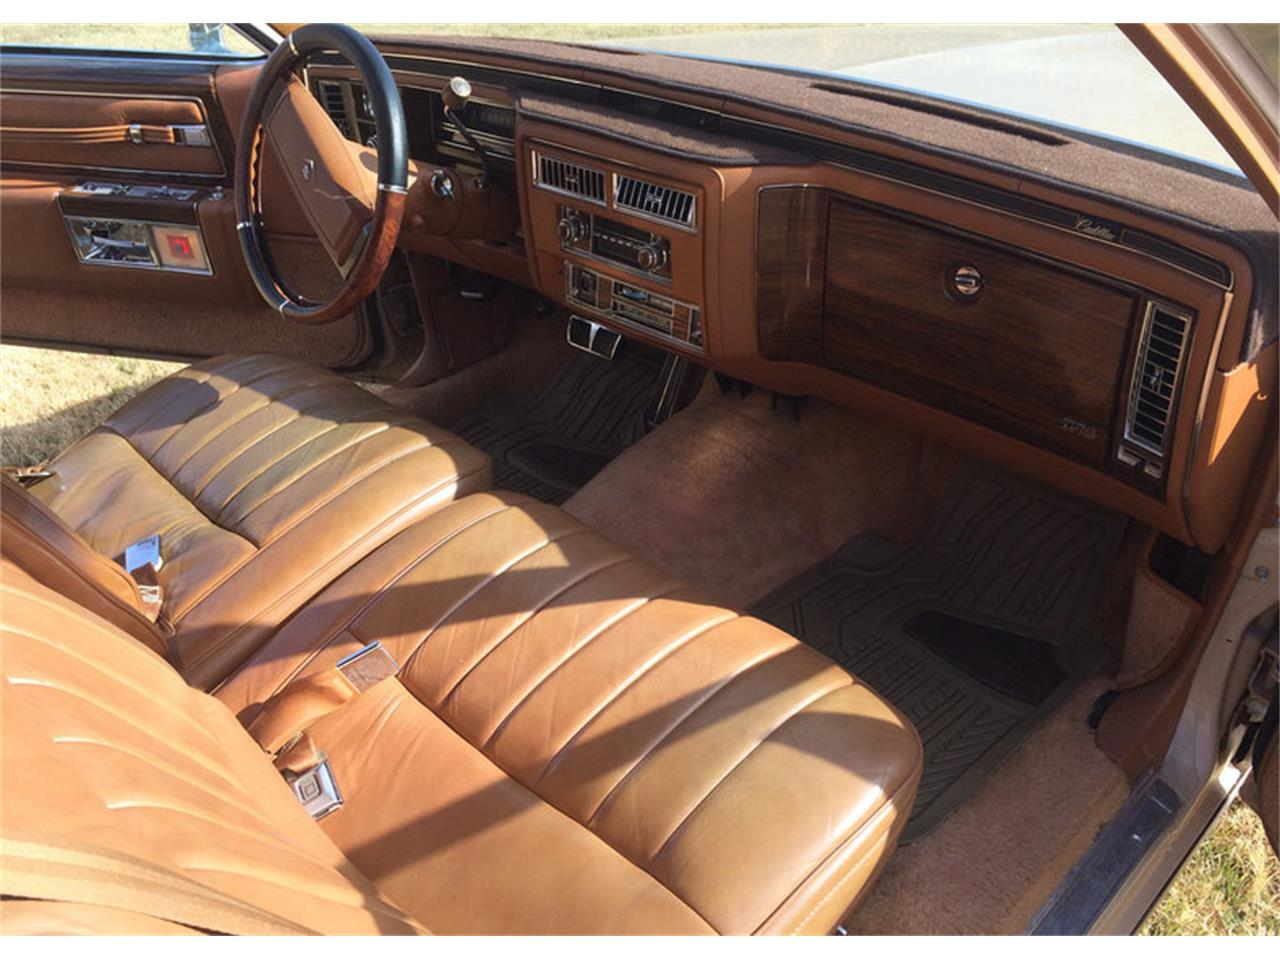 1978 Cadillac Coupe Deville For Sale Cc 1066565 Hub Cap Large Picture Of 78 Muyt